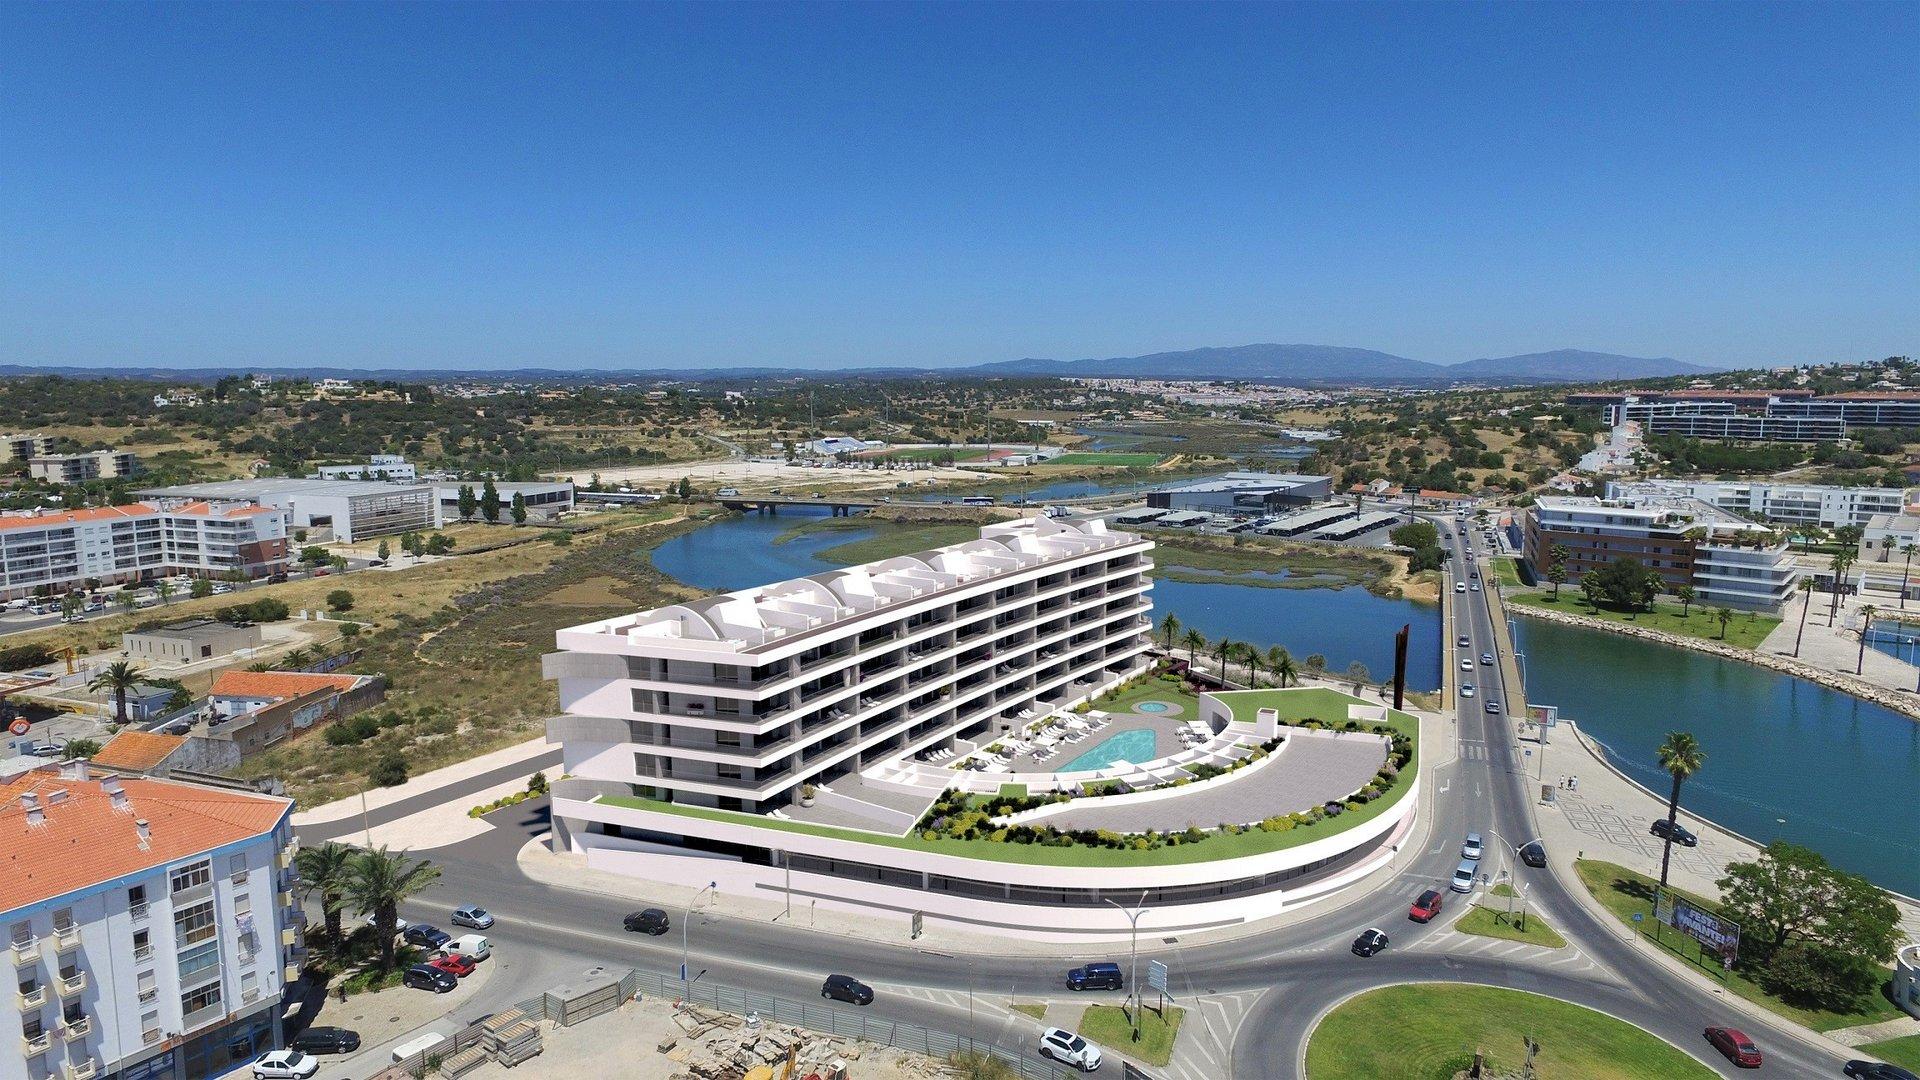 3 Bedroom Penthouse Lagos, Western Algarve Ref: GA412D